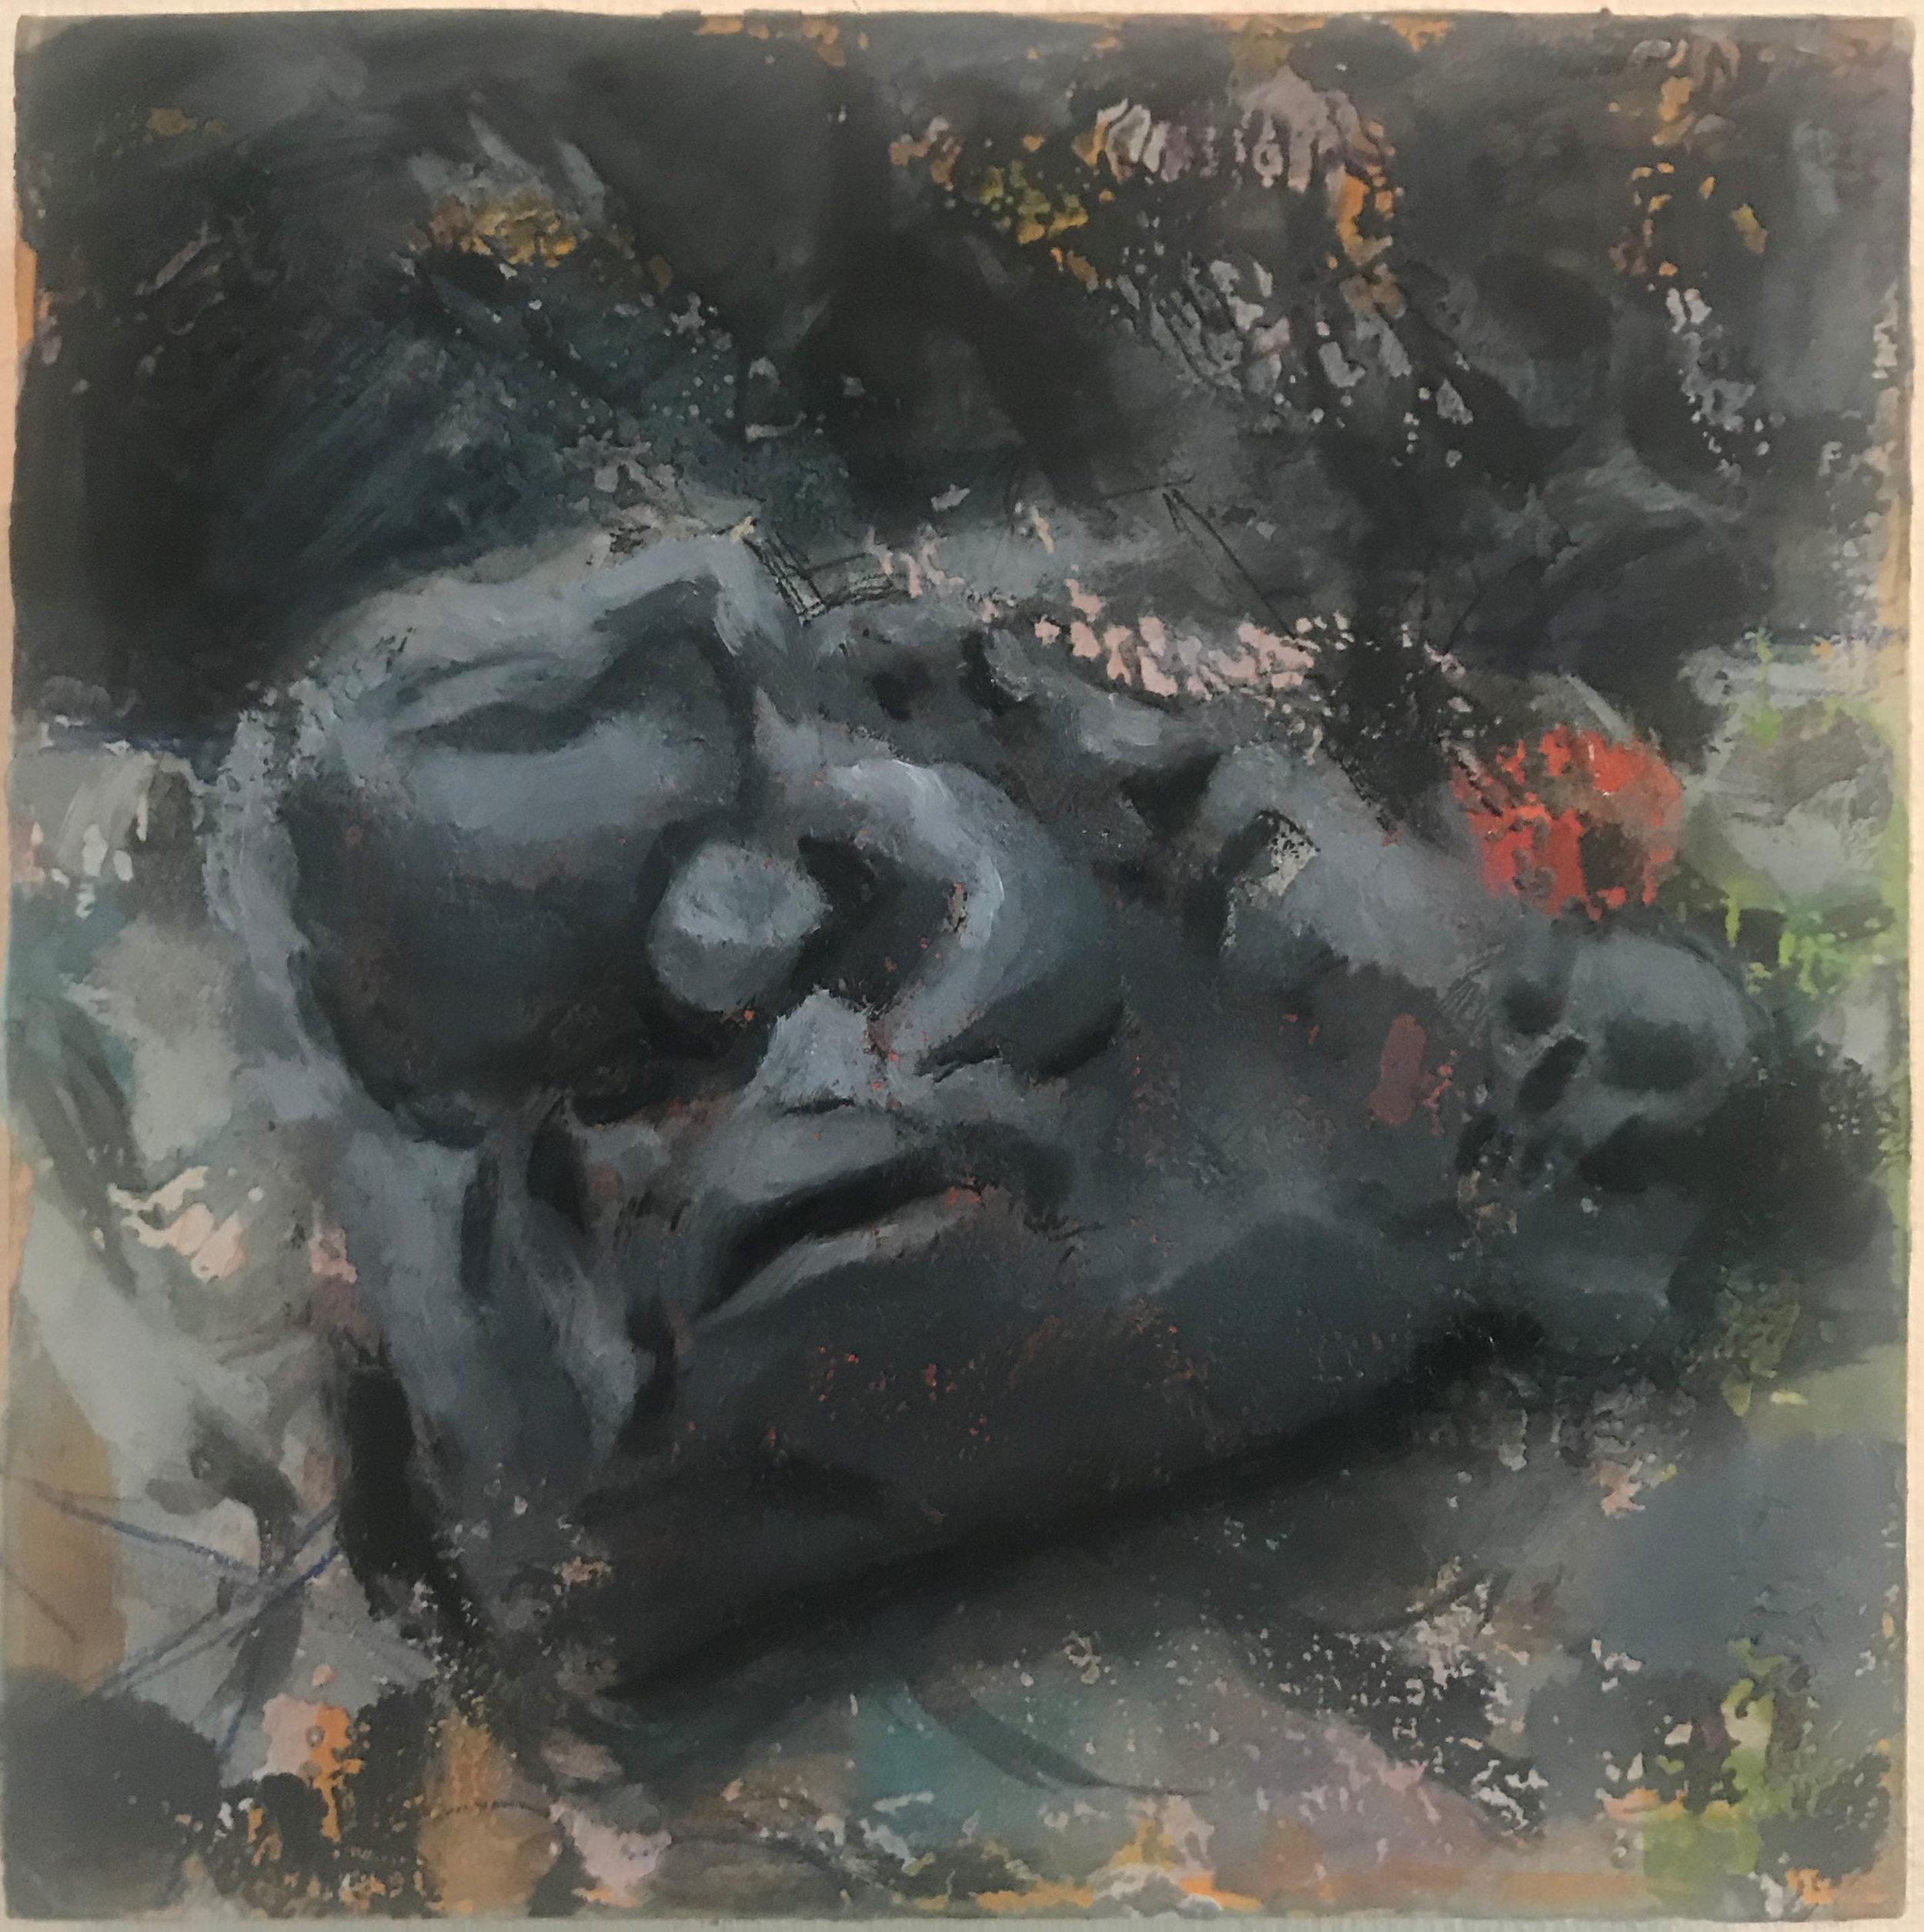 Sisifus painting.jpg